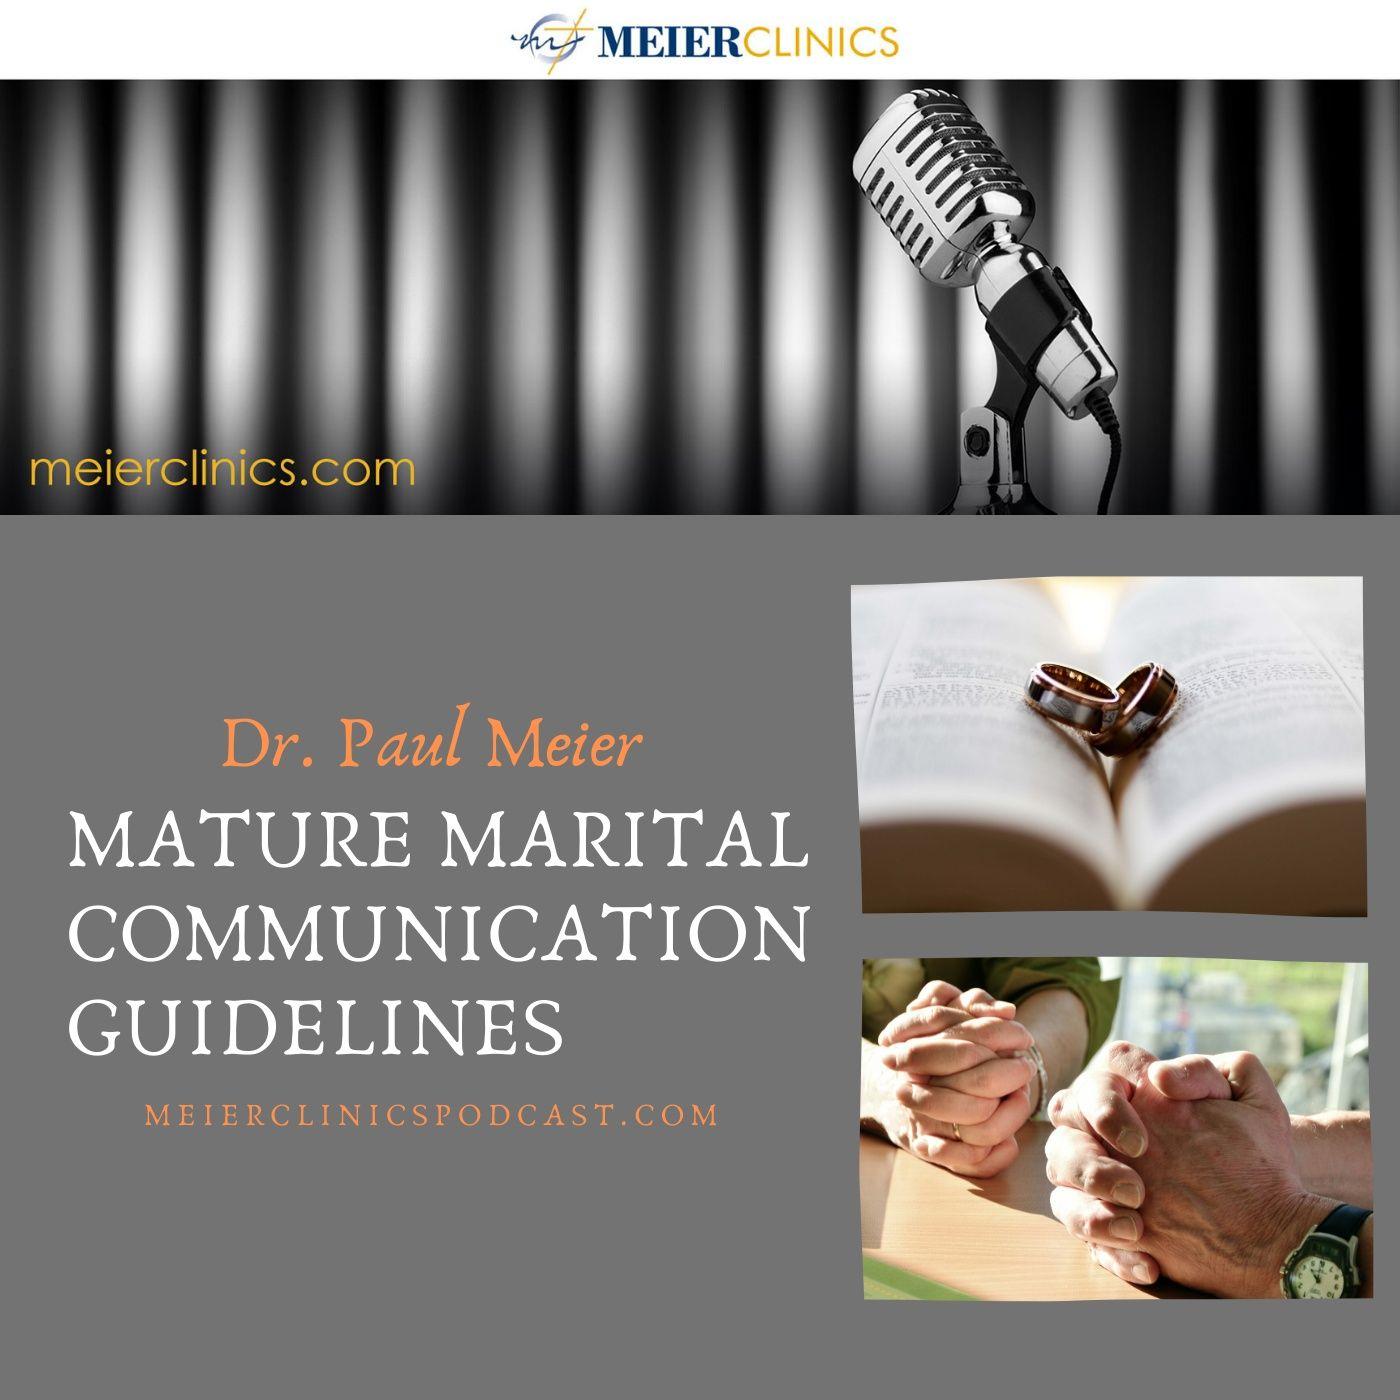 Mature Marital Communication Guidelines with Dr. Paul Meier